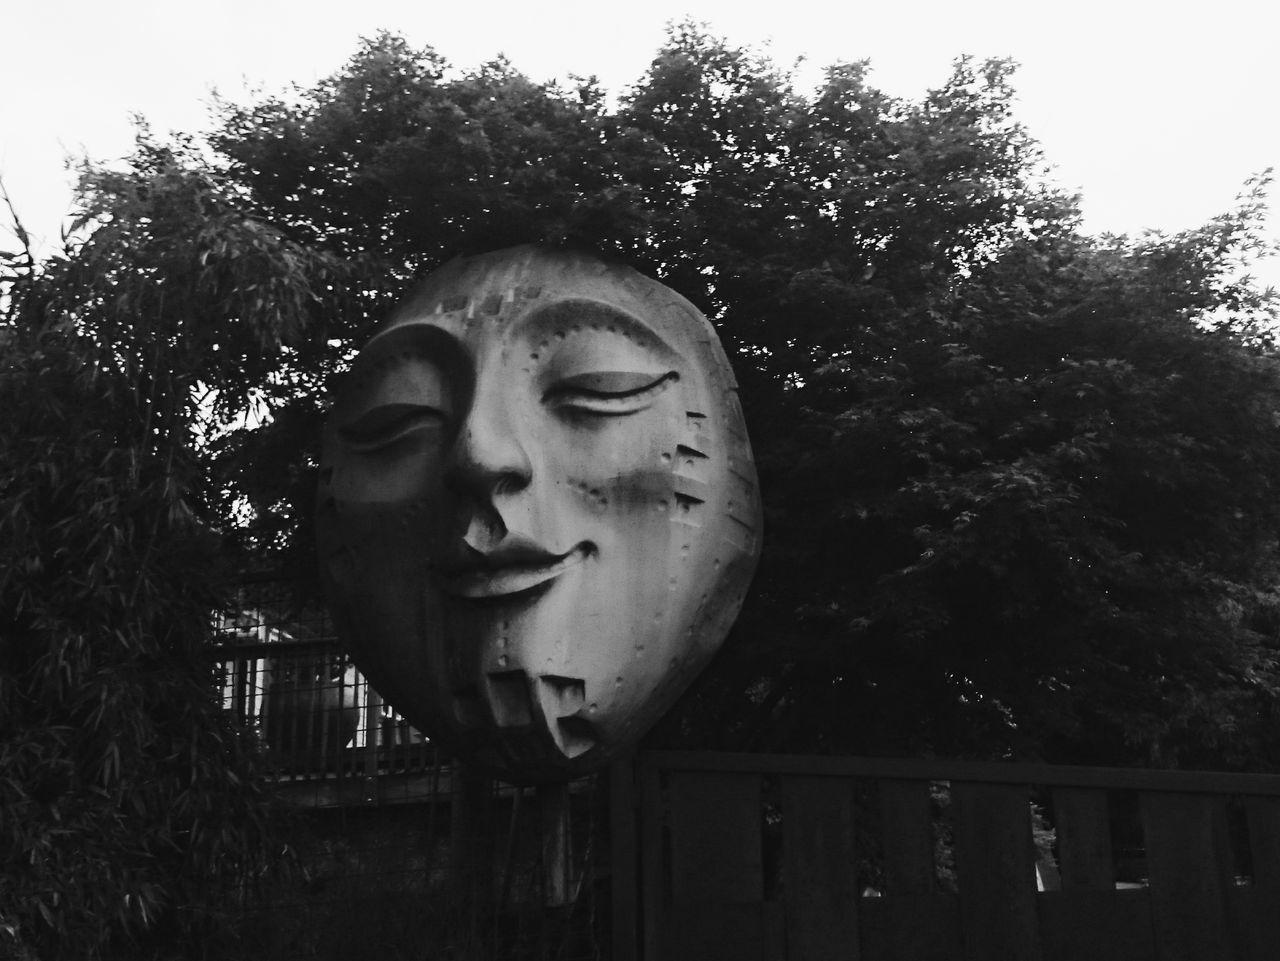 Surrealism Surreal Black And White Blackandwhite Monochrome Dream Face Human Representation Human Face Smile Calm Eyes Closed  Art Street Art